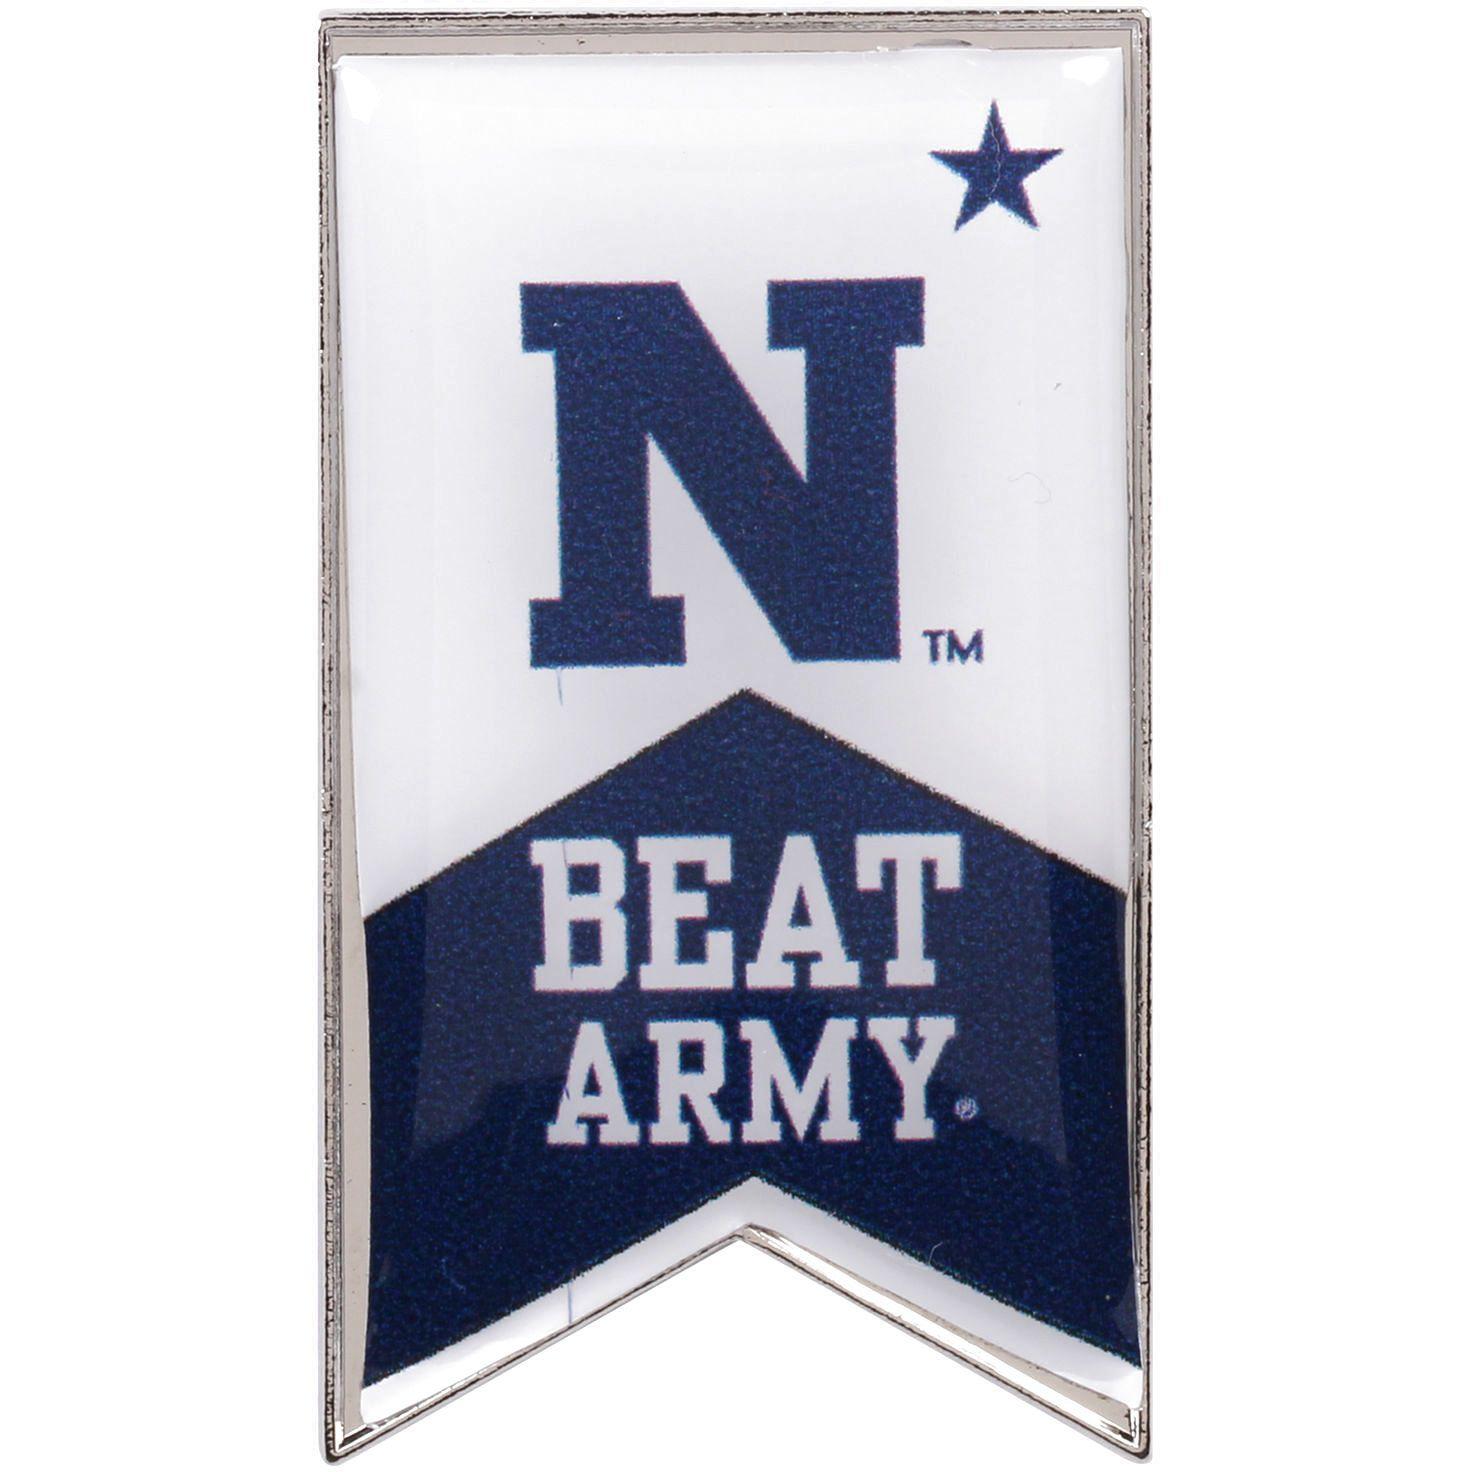 Navy Midshipmen Beat Army Rivalry Banner Pin - $5.59